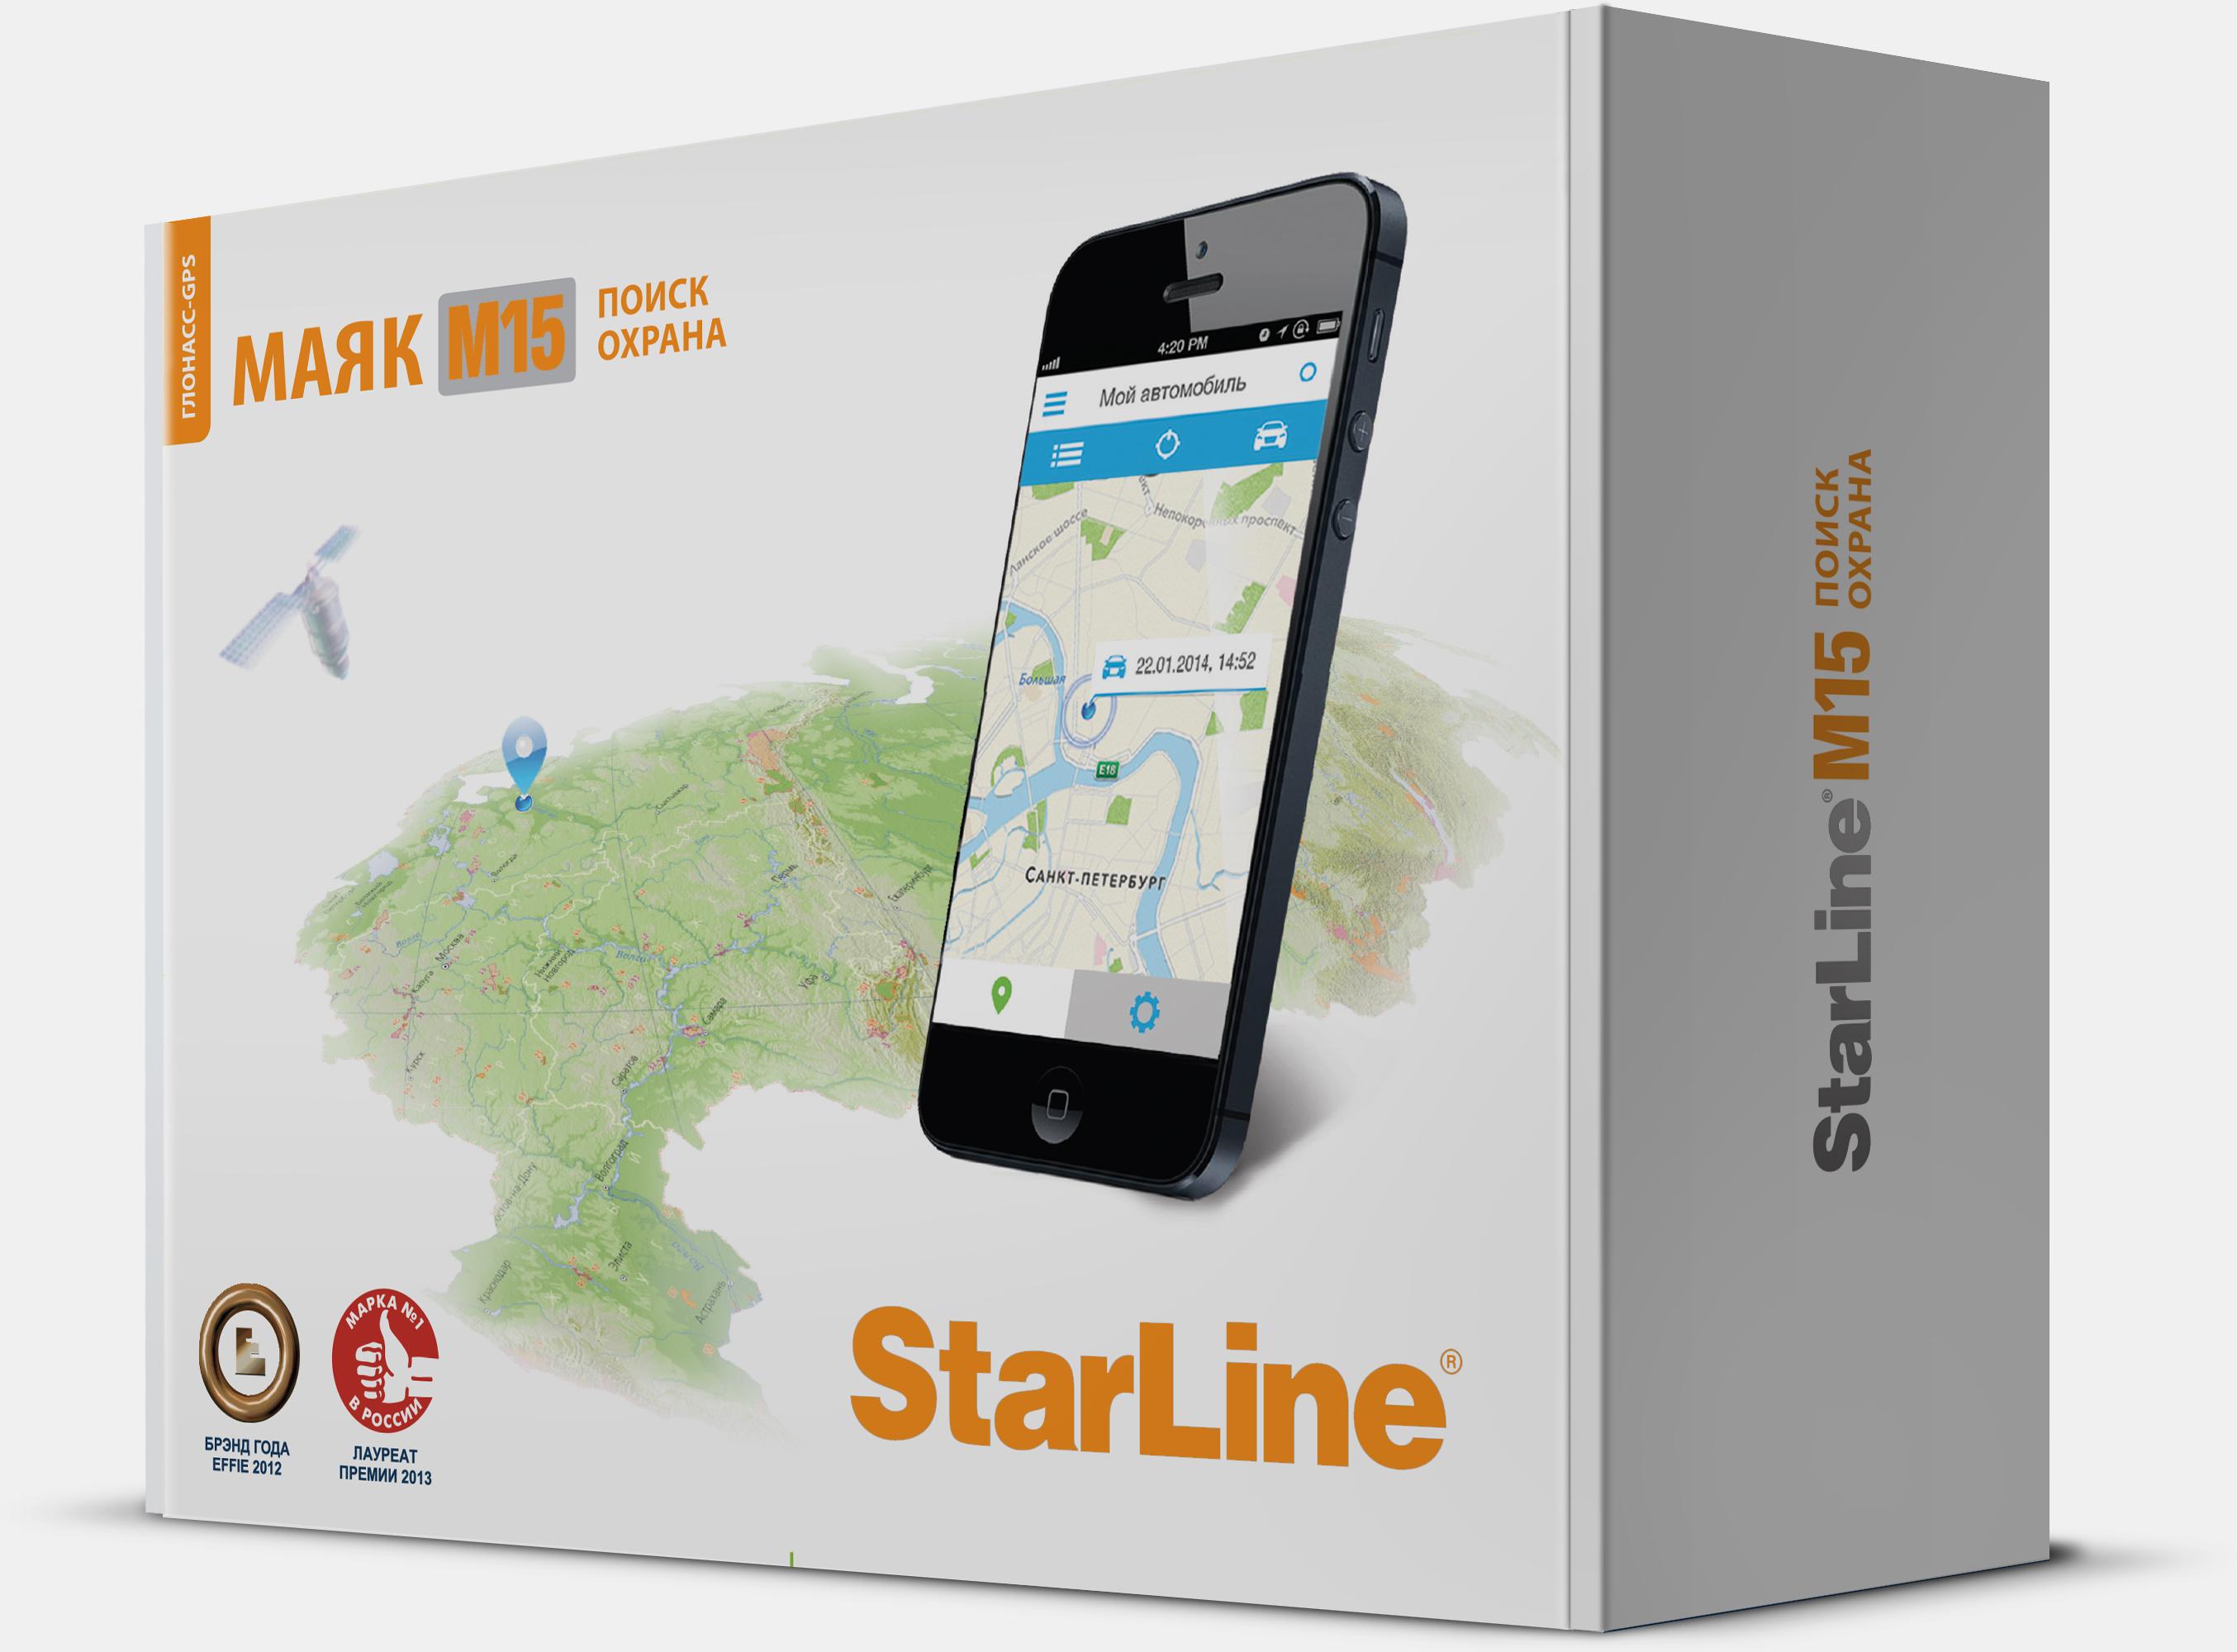 https://vologda-starline.avto-guard.ru/wp-content/uploads/2018/05/Starline-M15.jpg 227x168